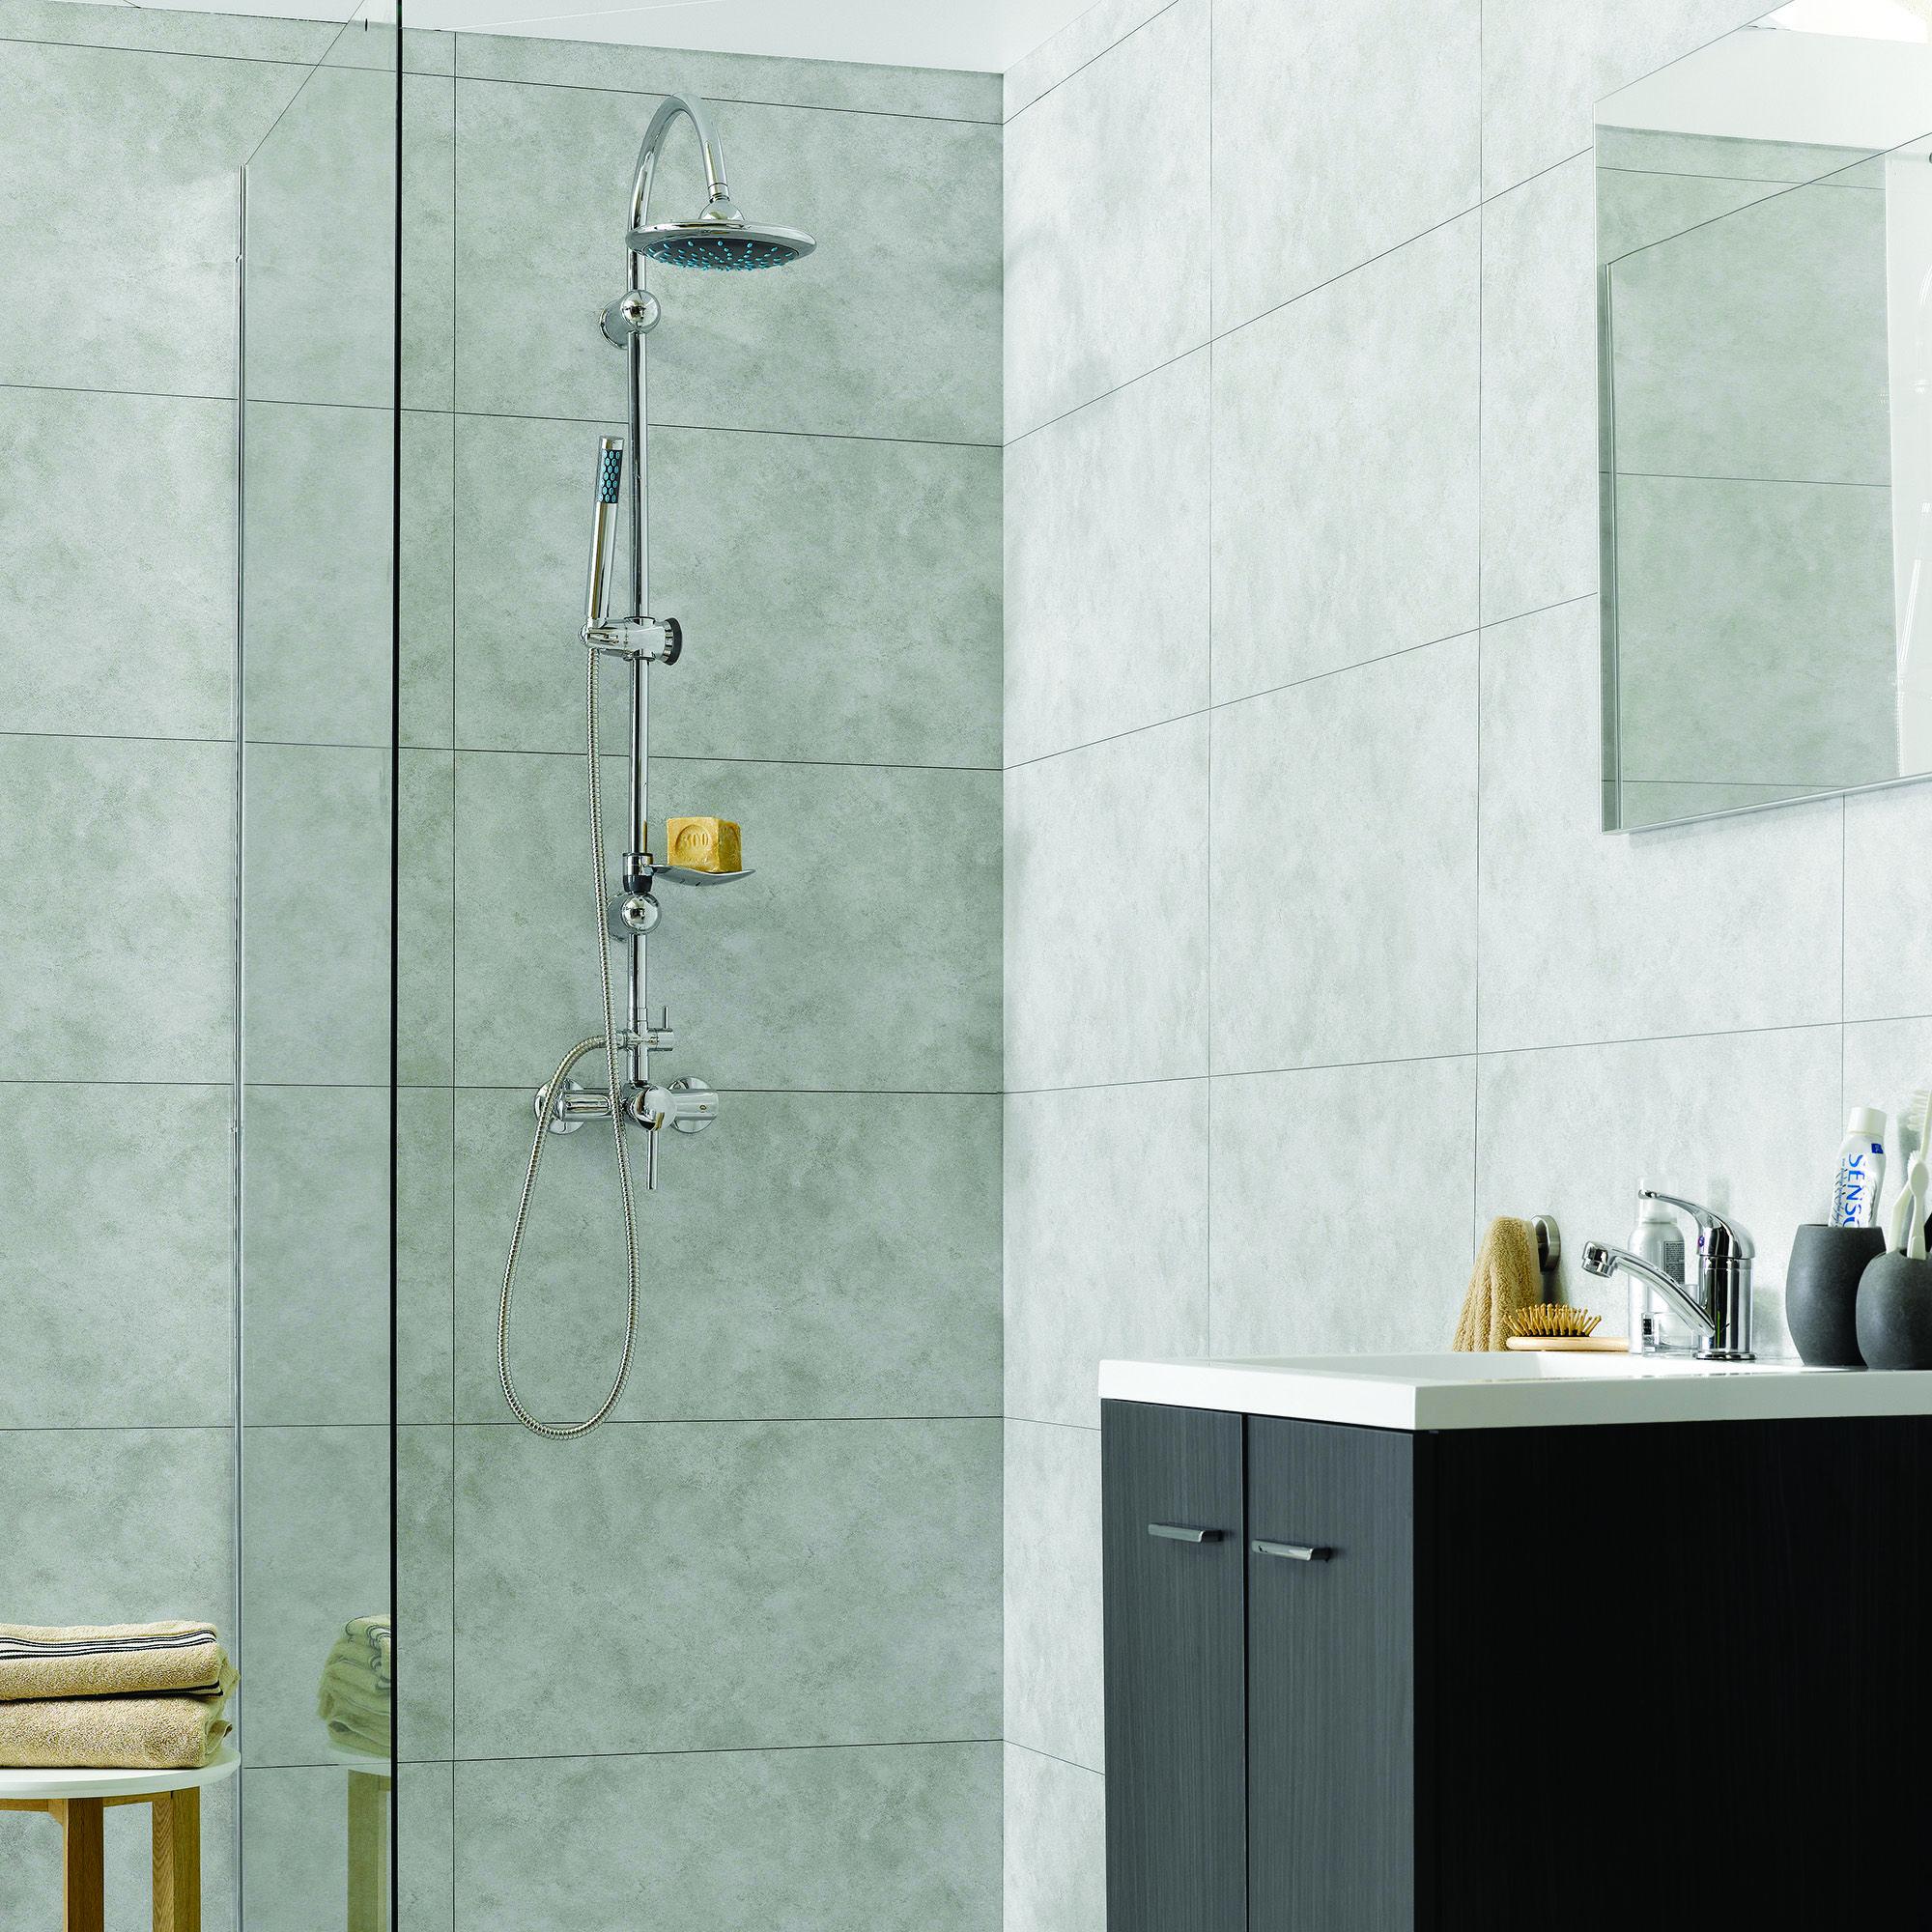 Dumawall Wall Panel In Rain Cloud Stone Backsplash Vinyl Wall Tiles Wall Tiles